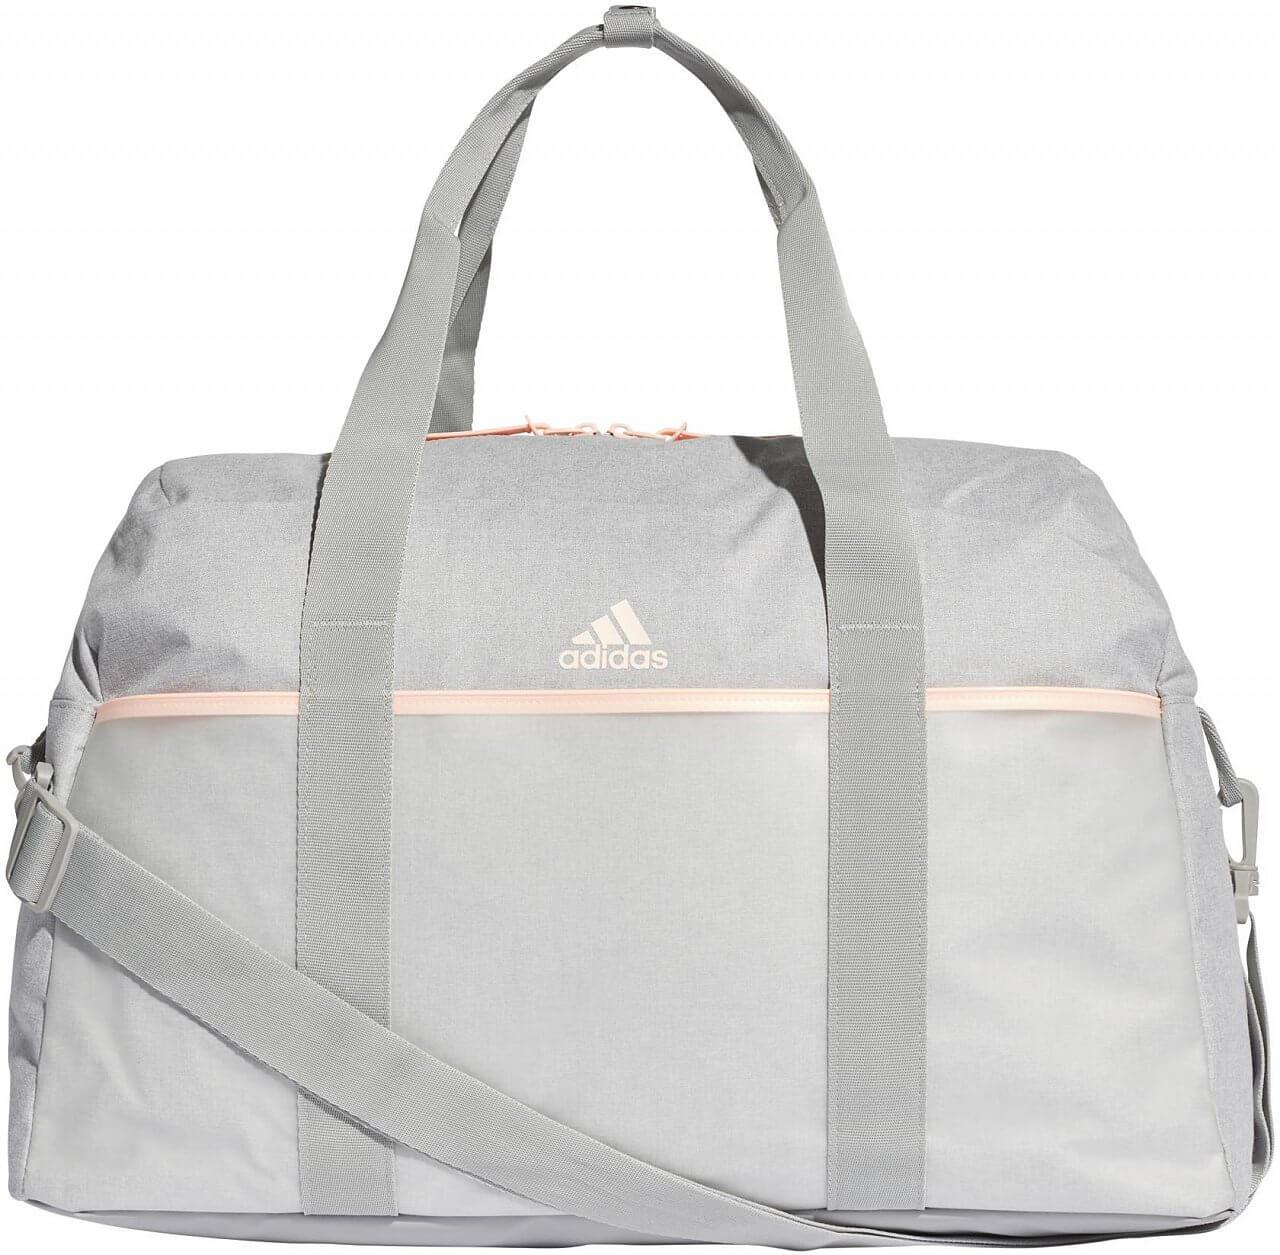 Sportovní taška adidas W Training ID Duffel Bag